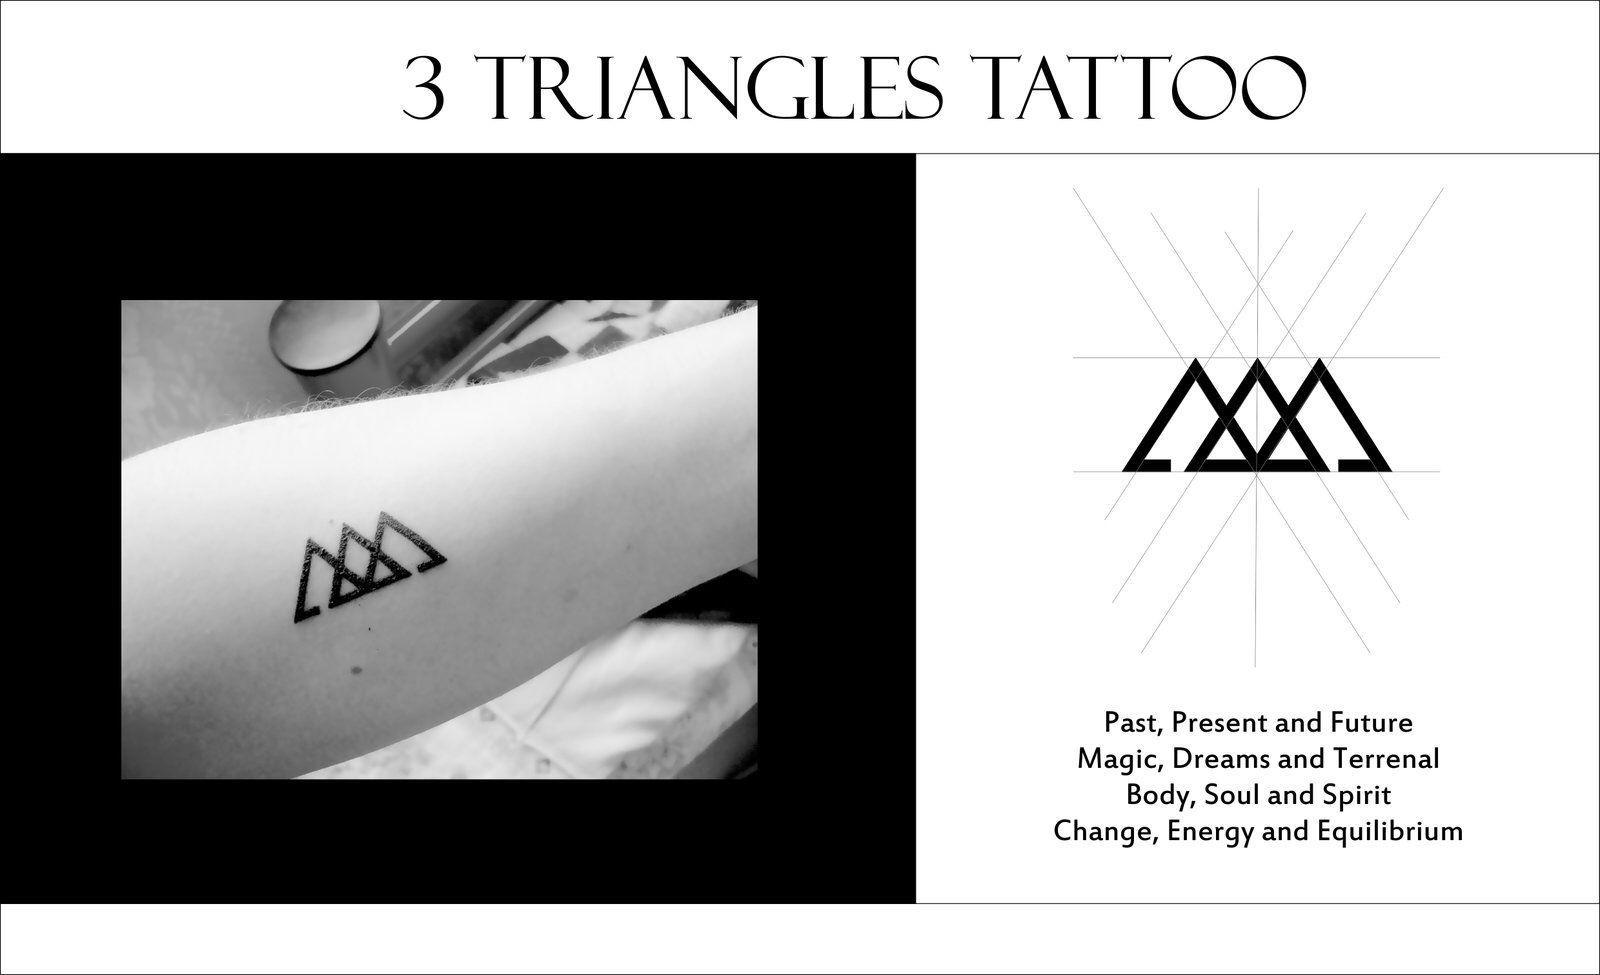 Pin By Rakhee Das On Tattooed In 2018 Pinterest Tattoos